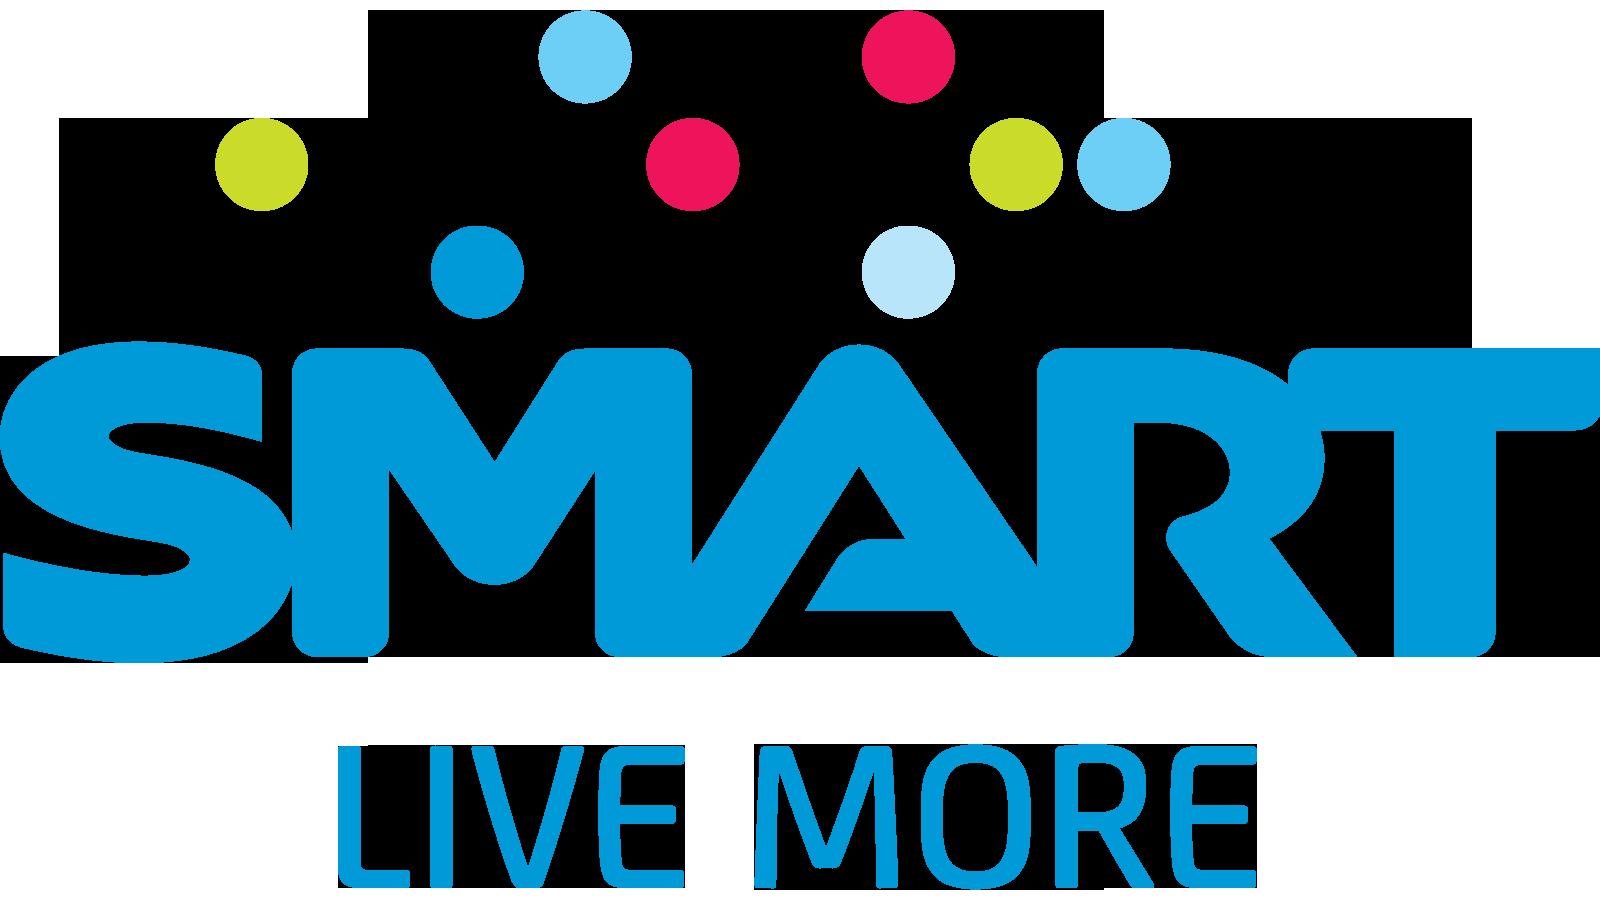 Smart logo clipart banner stock Free Smart Car Cliparts, Download Free Clip Art, Free Clip ... banner stock